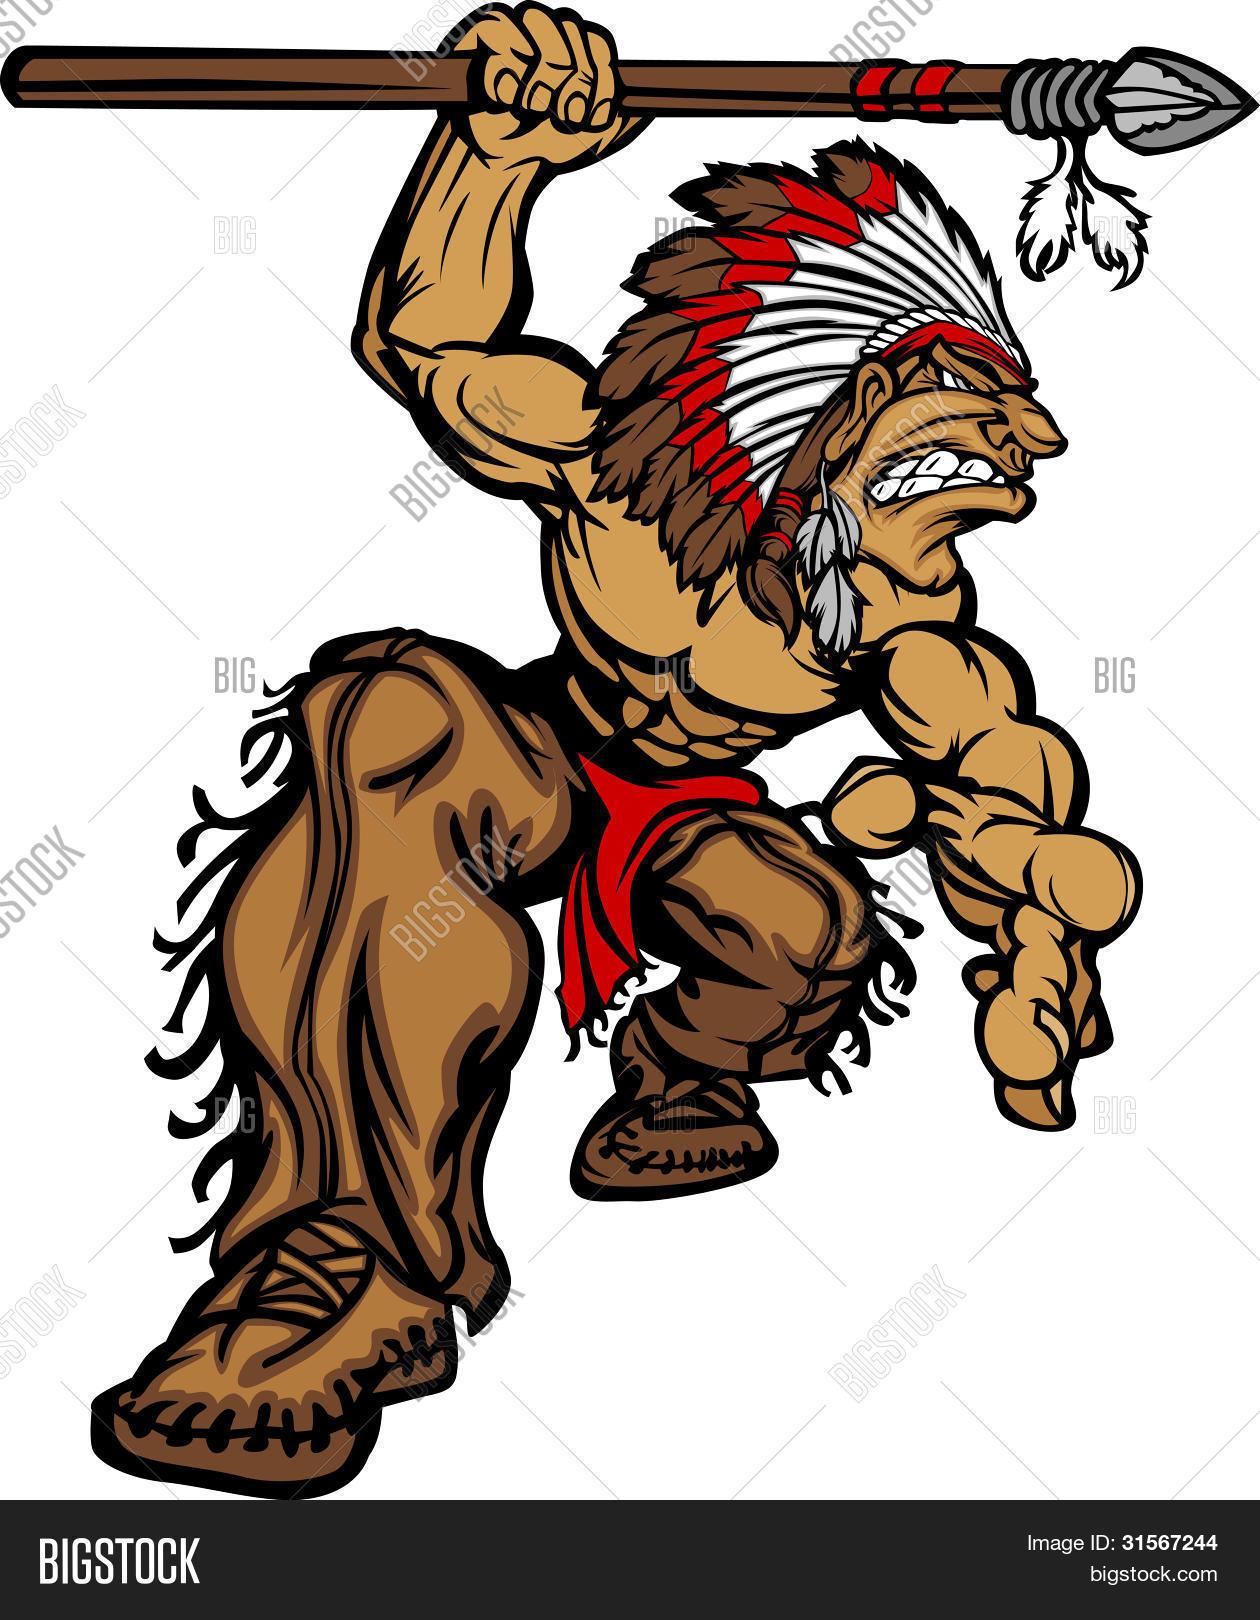 indian chief mascot vector photo free trial bigstock